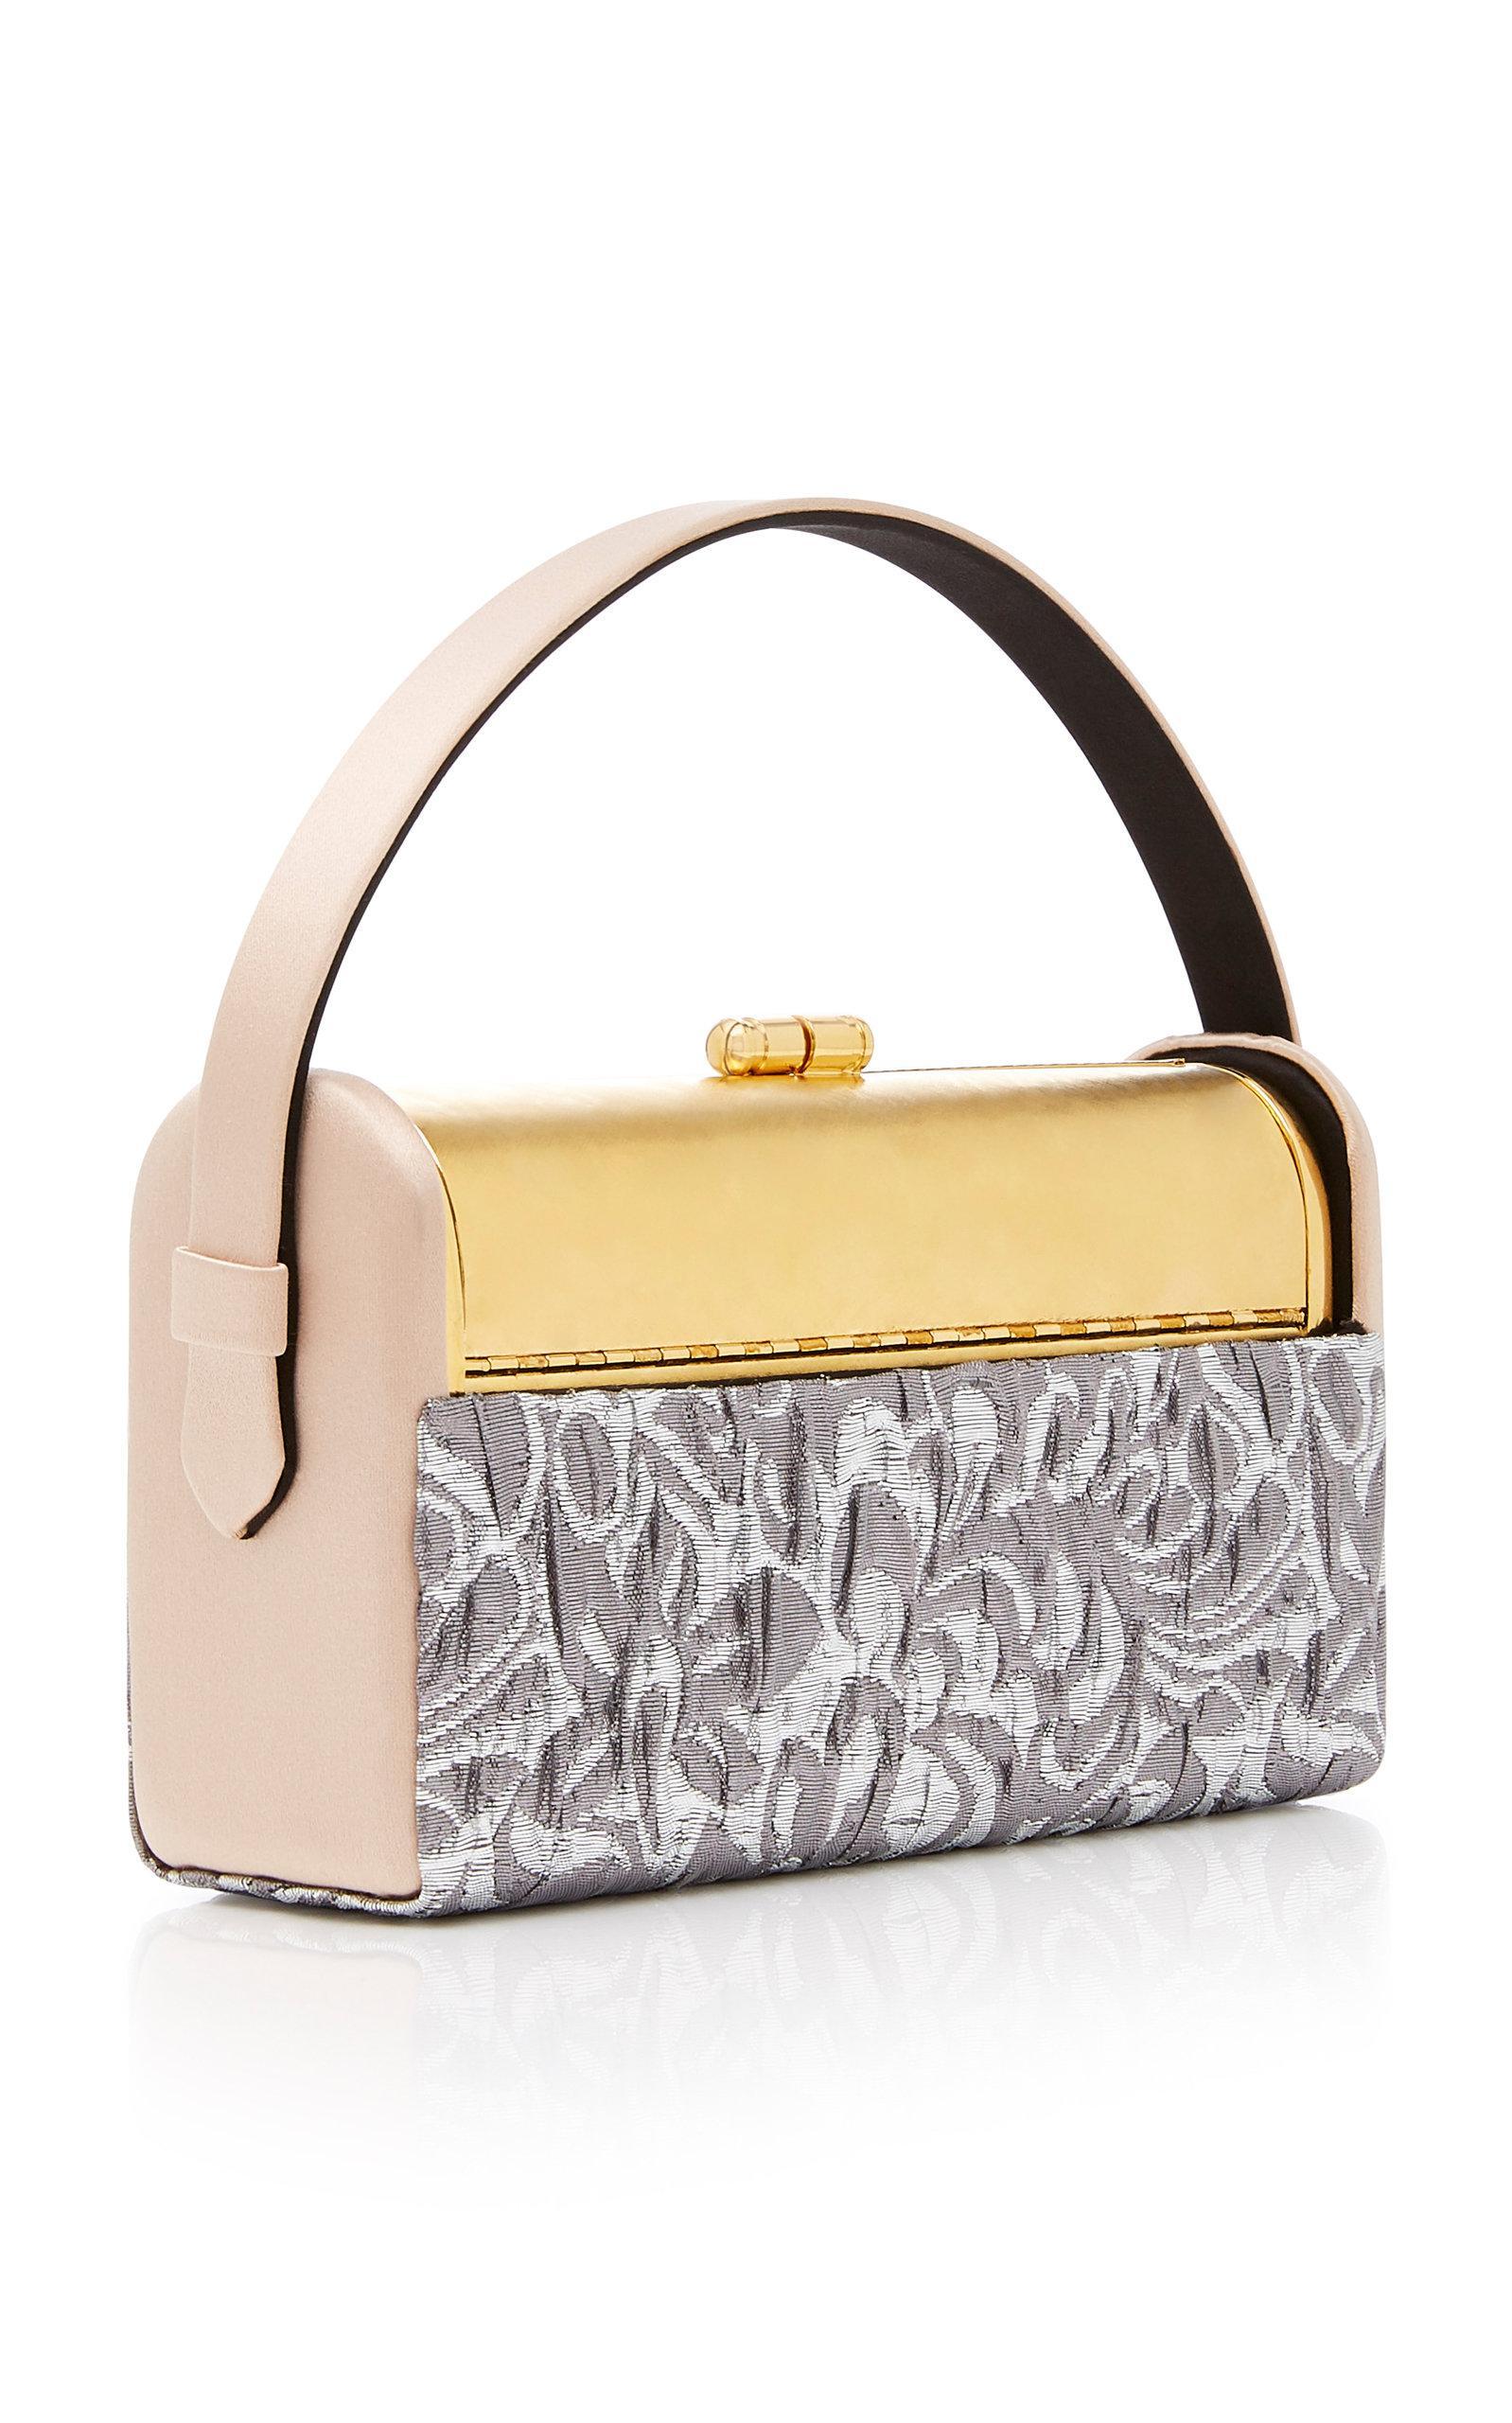 Discount Good Selling Comfortable Regine brocade satin bag Bienen-Davis Clearance Choice Discount Fake oWNCi